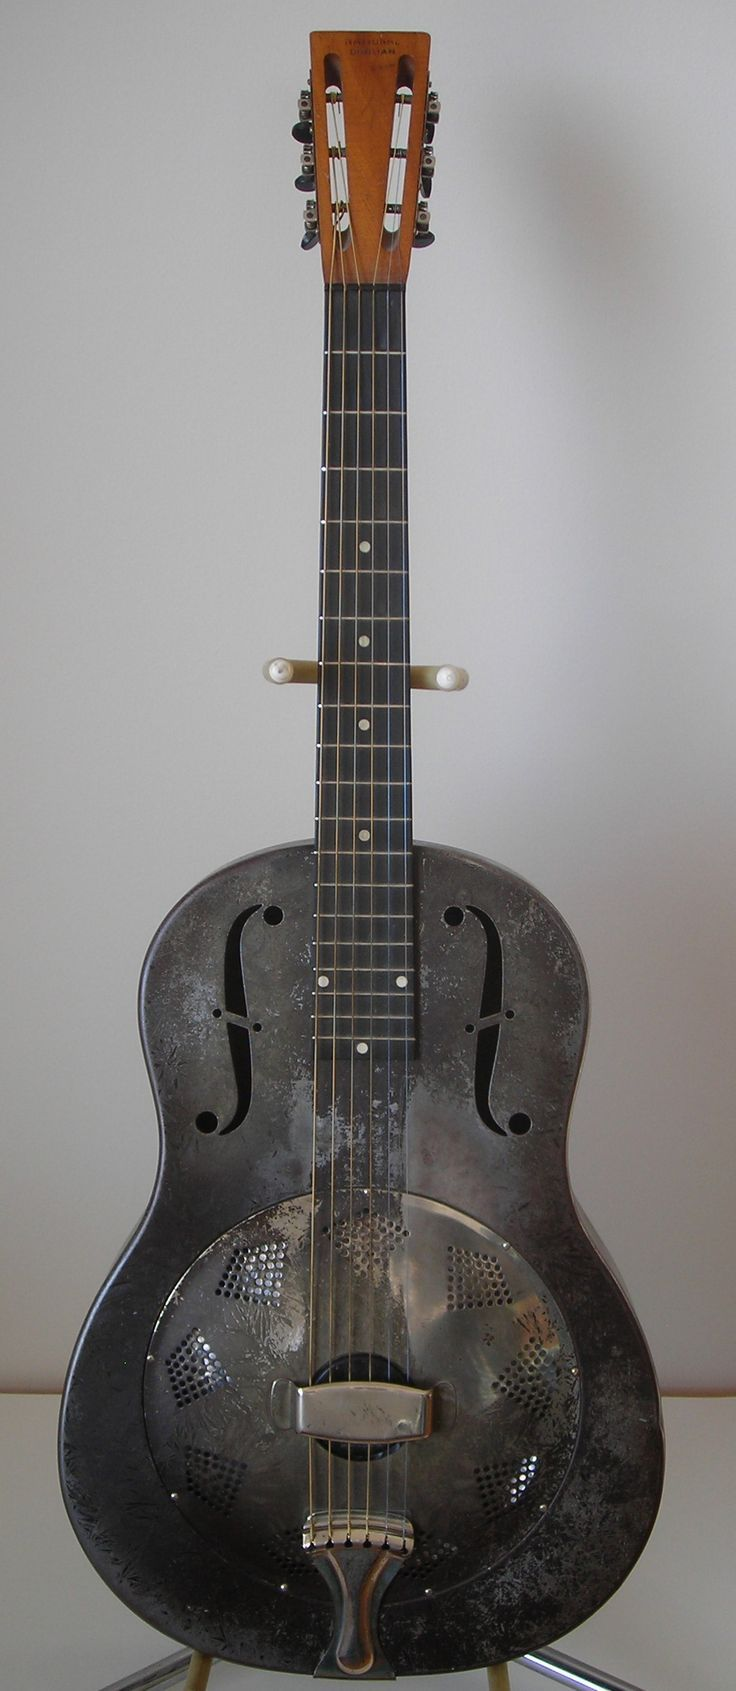 Dobro Bluegrass Tablature - Harp Guitar